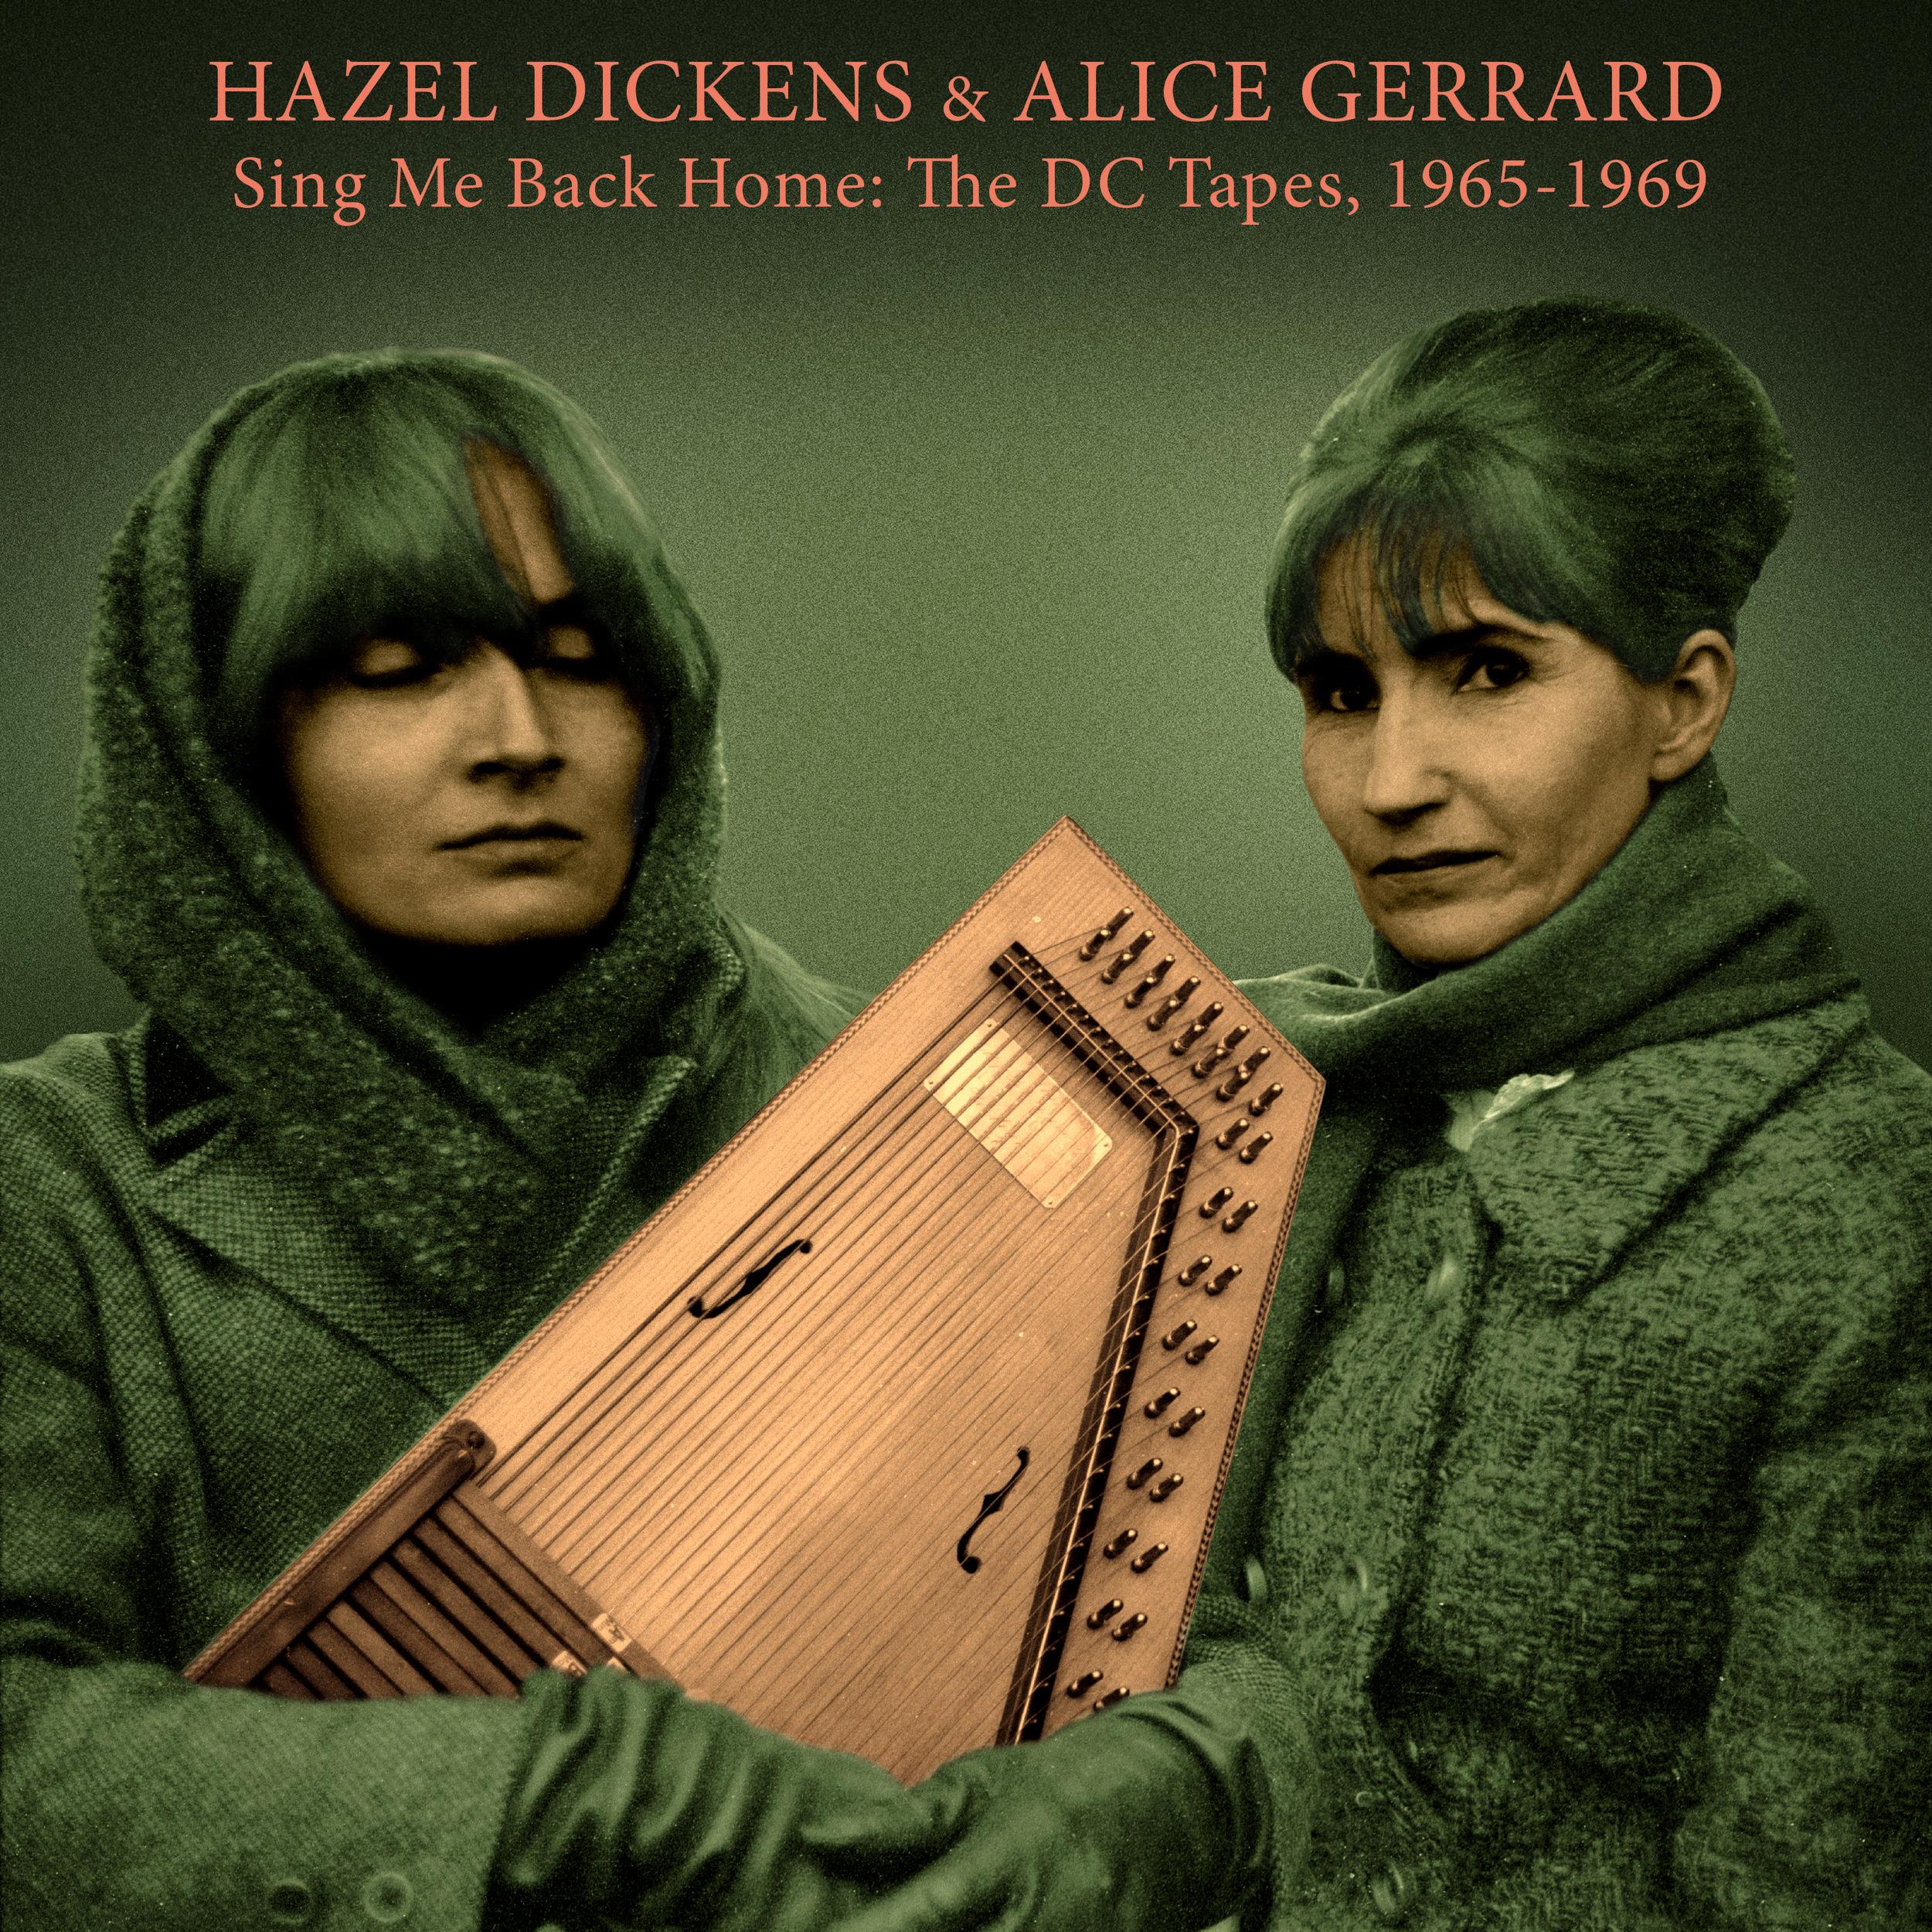 H&A FINAL COVER 3000px.jpg